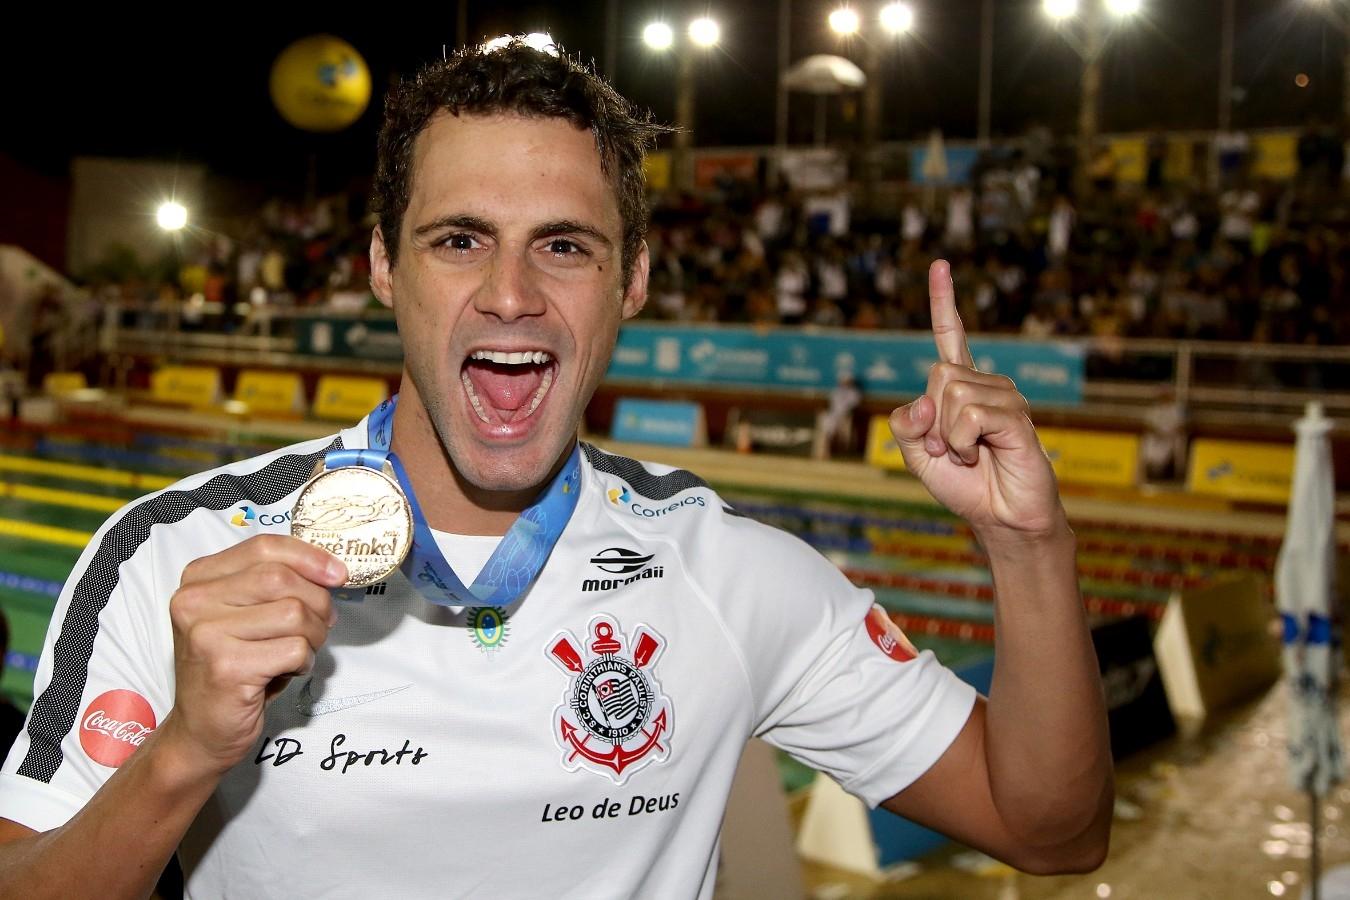 Leonardo de Deus - Trofeu Jose Finkel de Natacao no Clube Internacional de Regatas. 15 de Setembro de 2016, Santos, SP, Brasil. Foto:Satiro Sodré/SSPress.